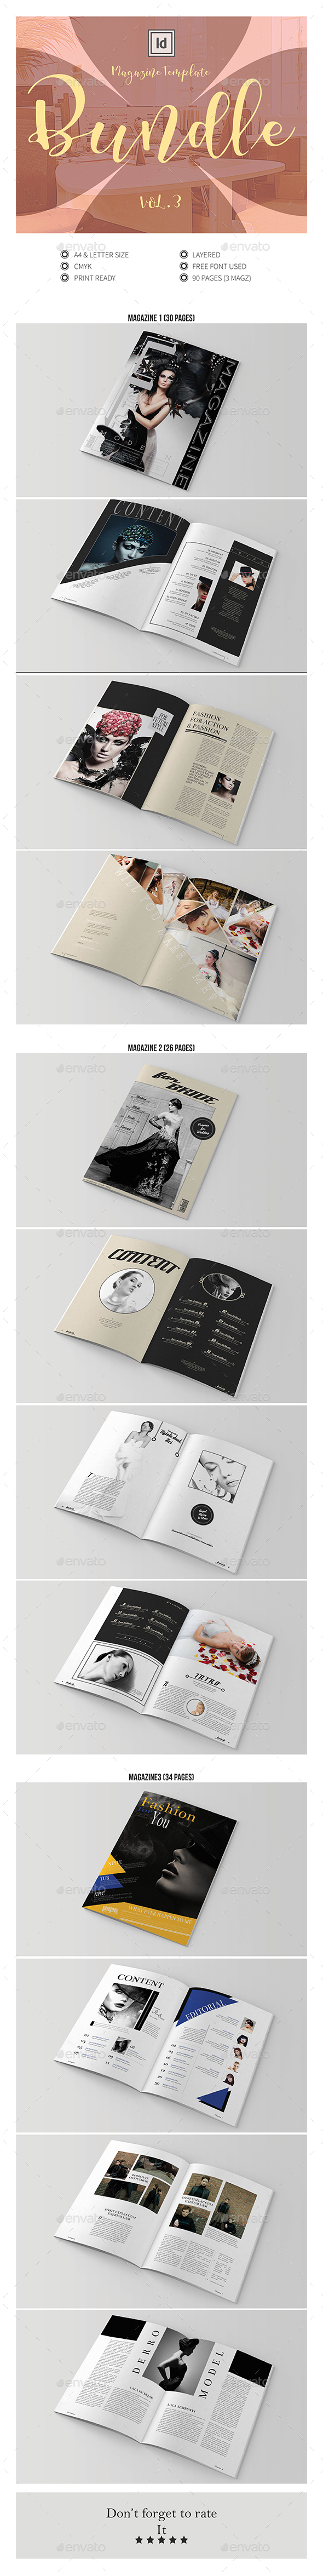 Multipurpose InDesign Magazine Template Bundle V.3 - Magazines Print Templates